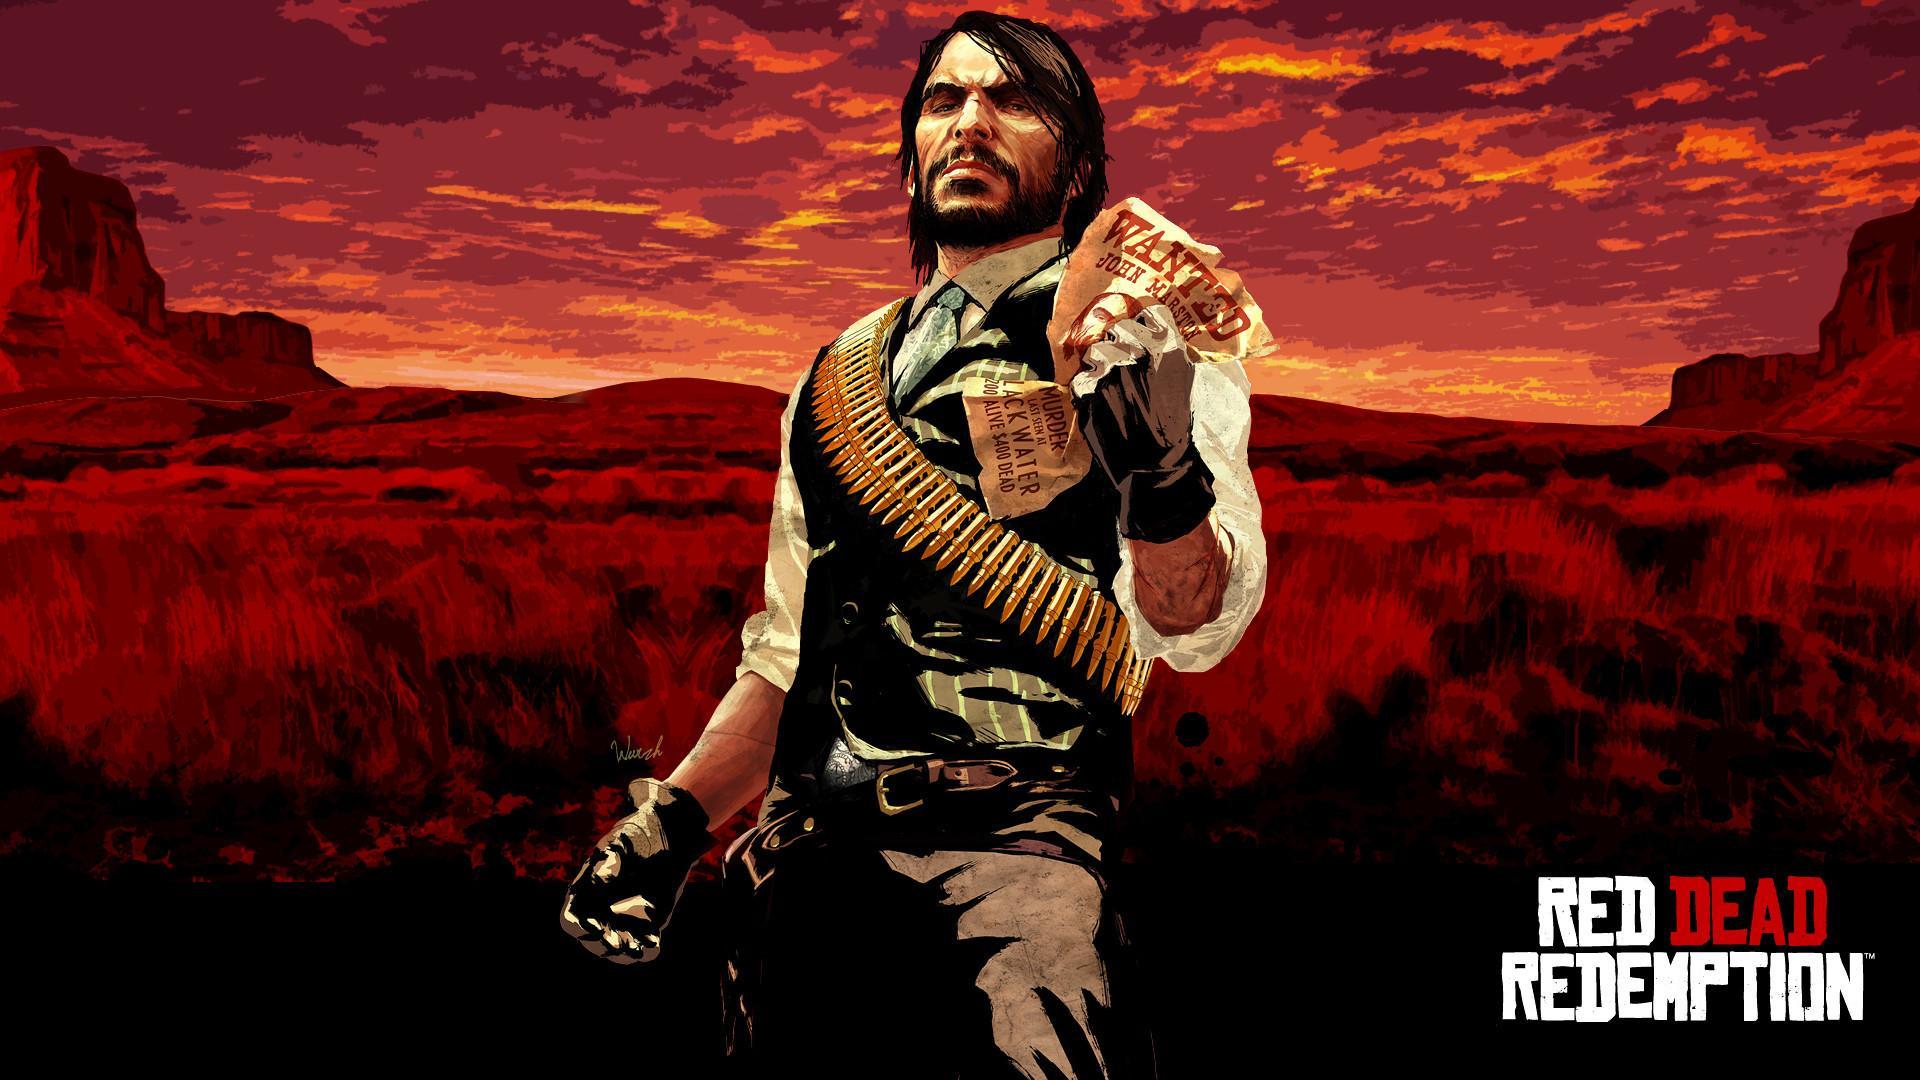 Red Dead Redemption Wallpaper Hd Red Dead Redemption John